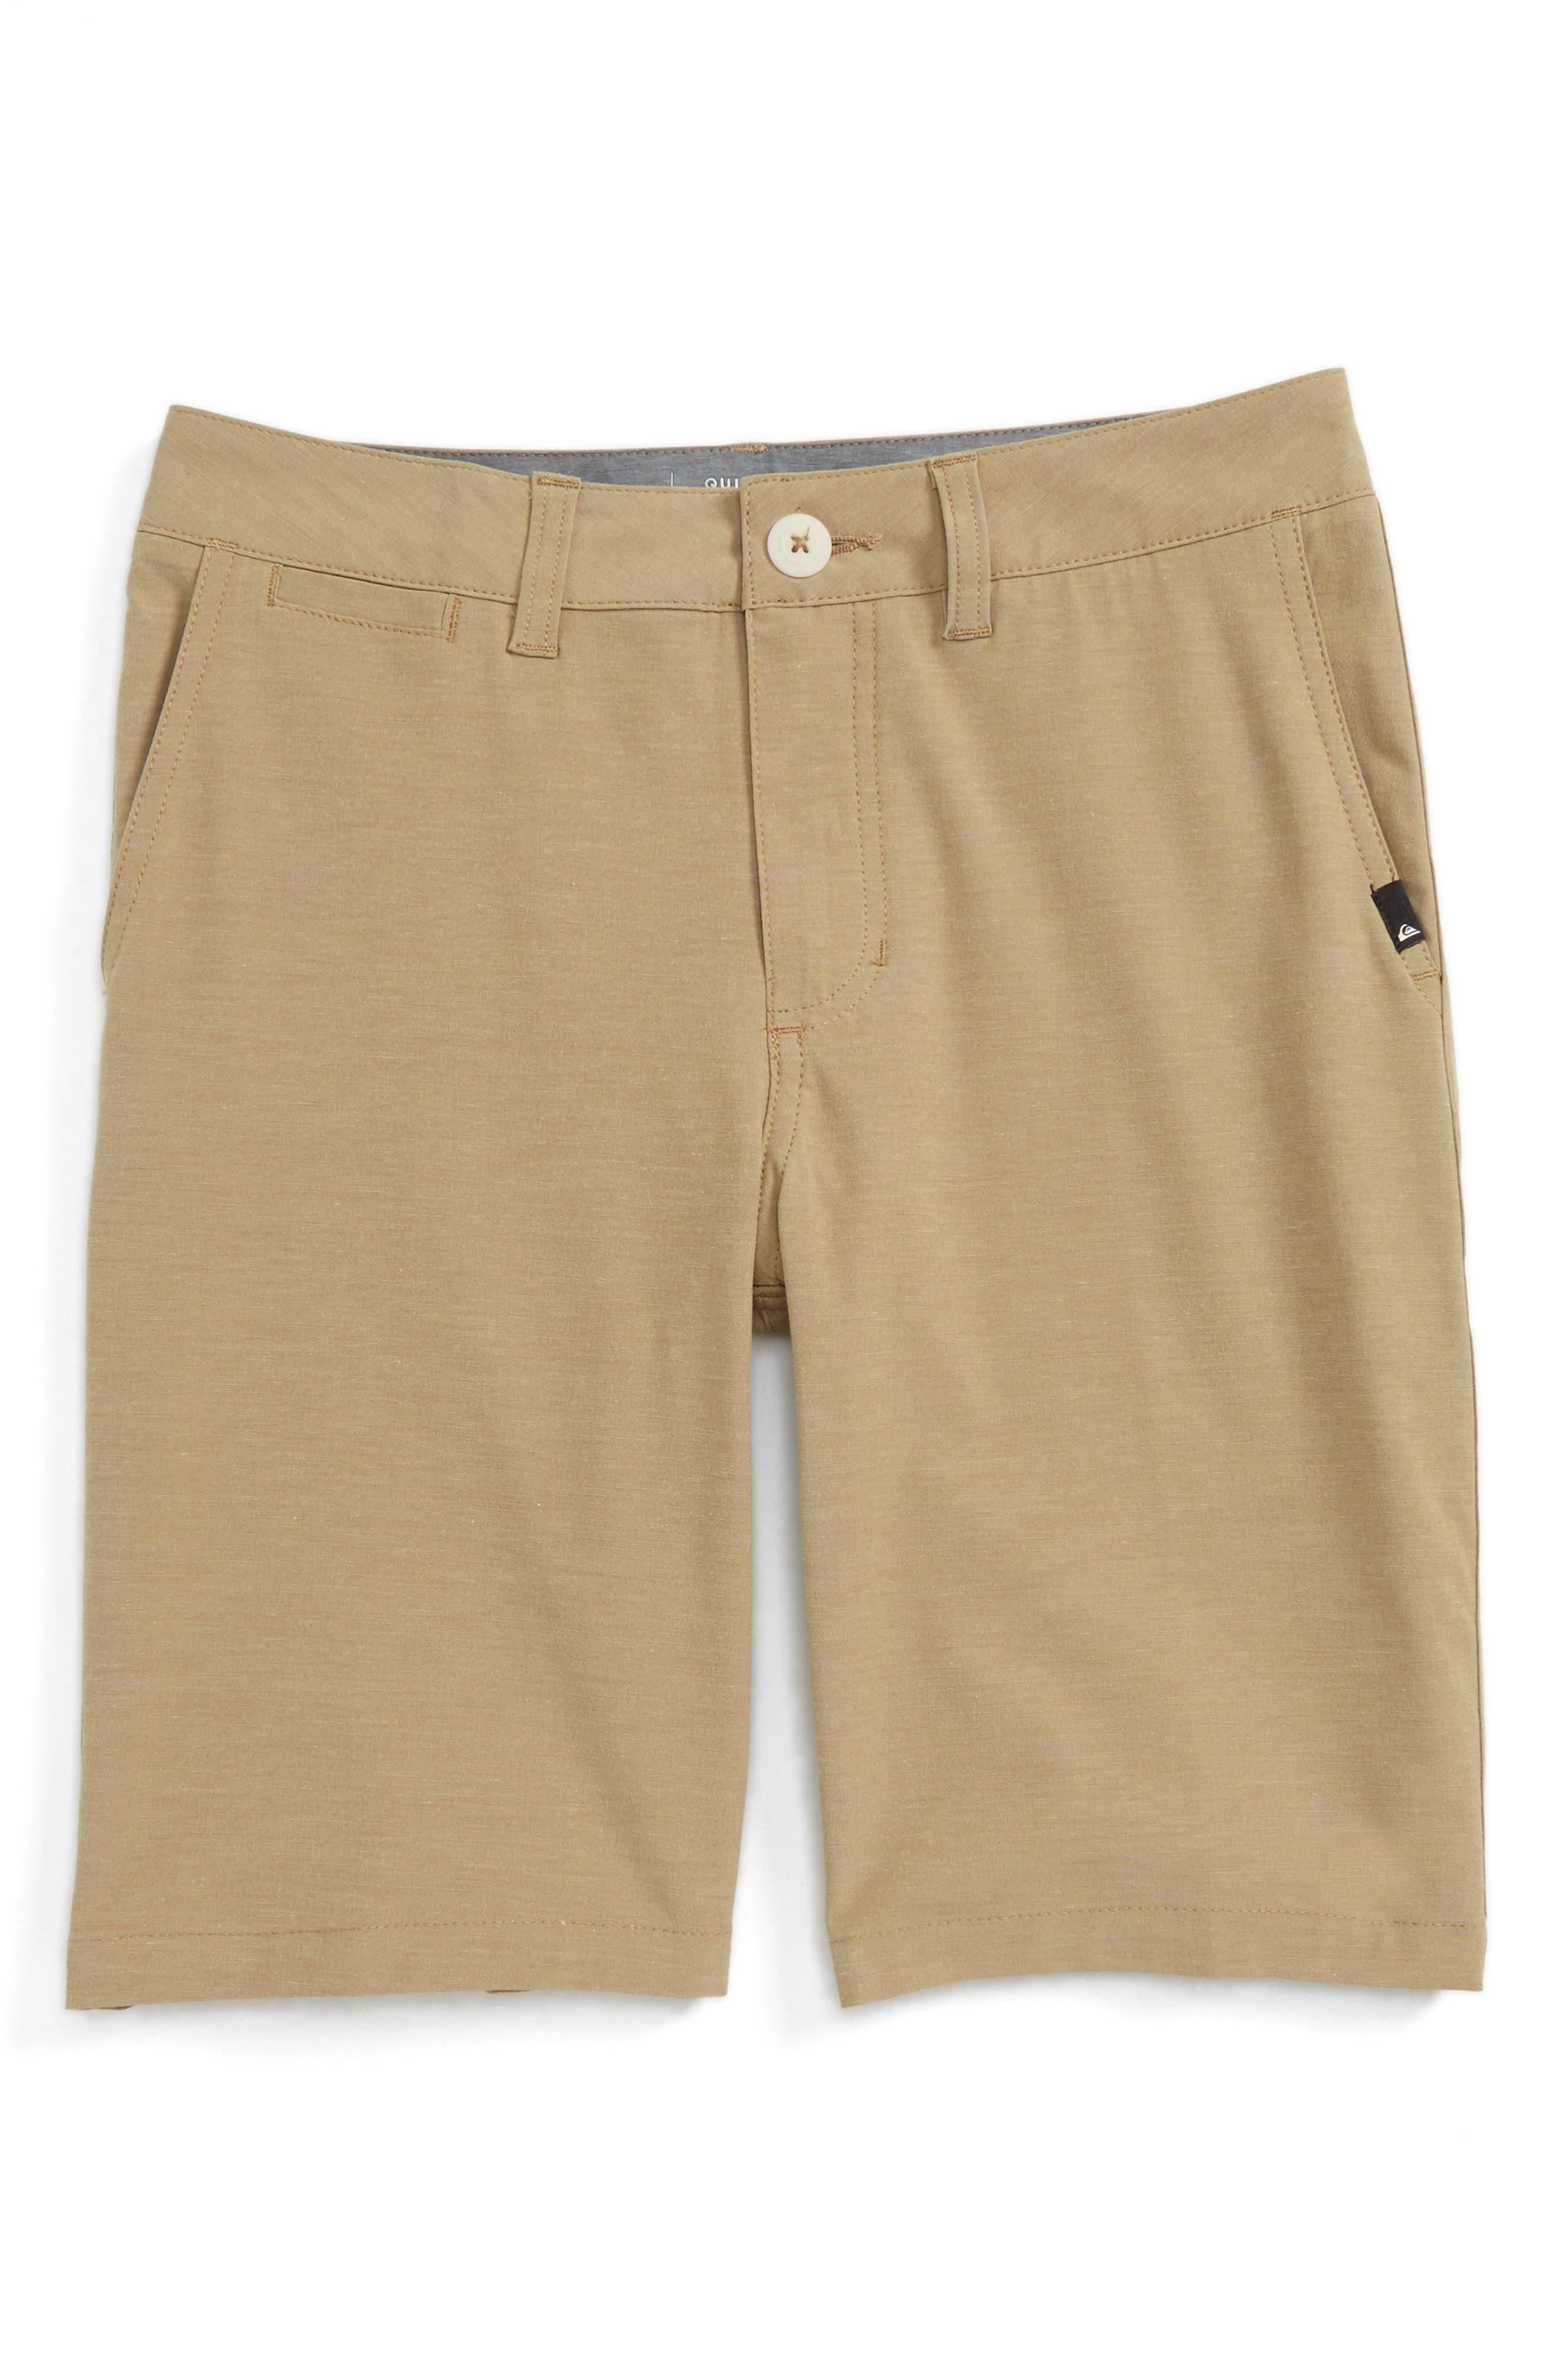 Amphibian Hybrid Shorts,                             Main thumbnail 4, color,